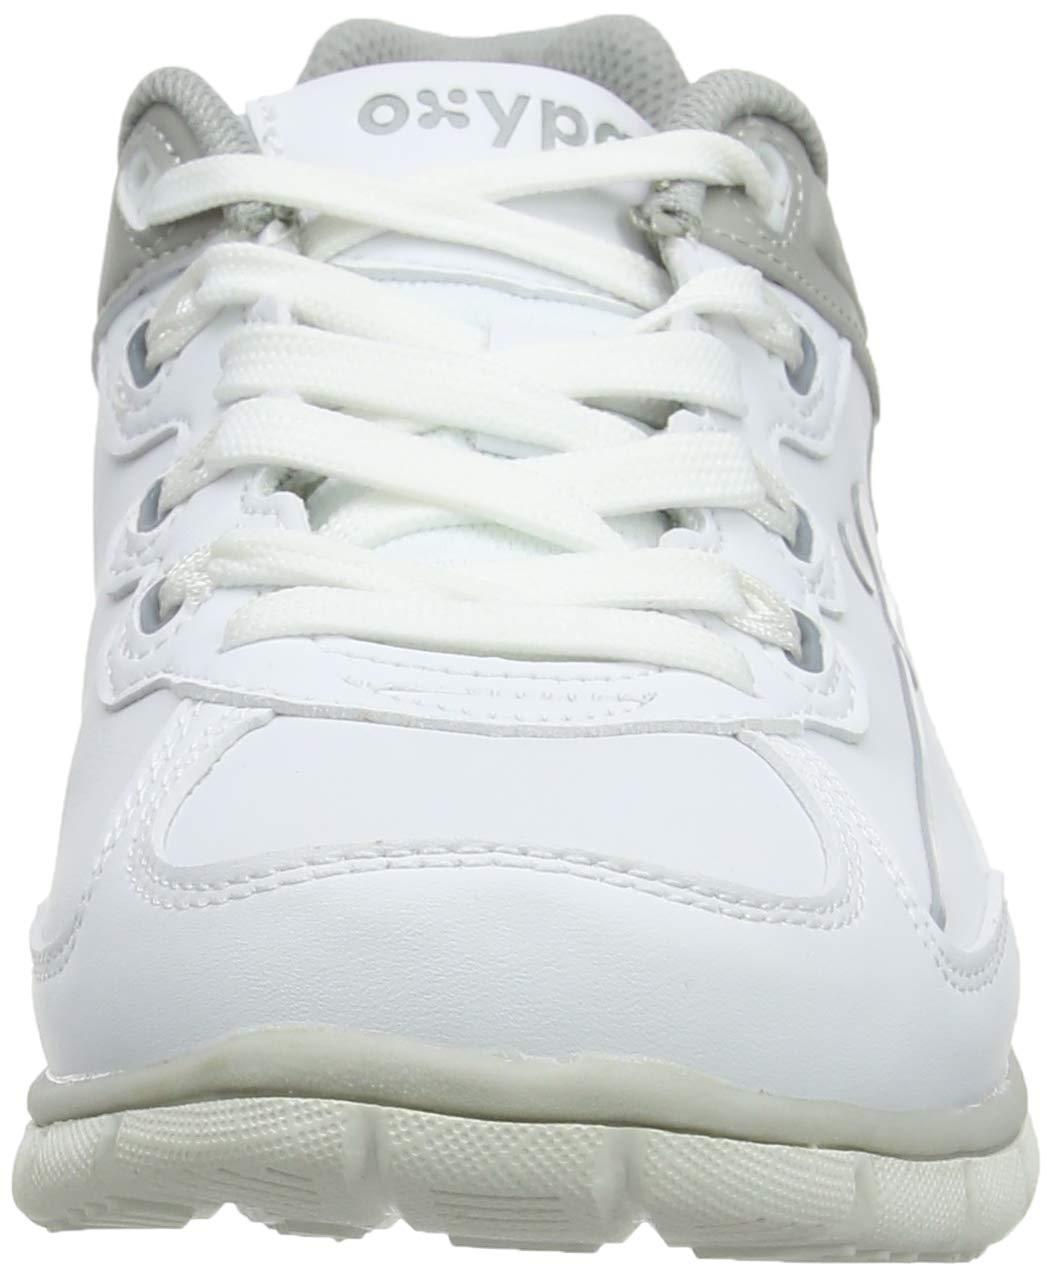 White//Fuchsia 4 UK Antistatic Leather Nursing Trainers Oxypas Oxysport Sunny Slip-resistant Fuchsia 37 EU